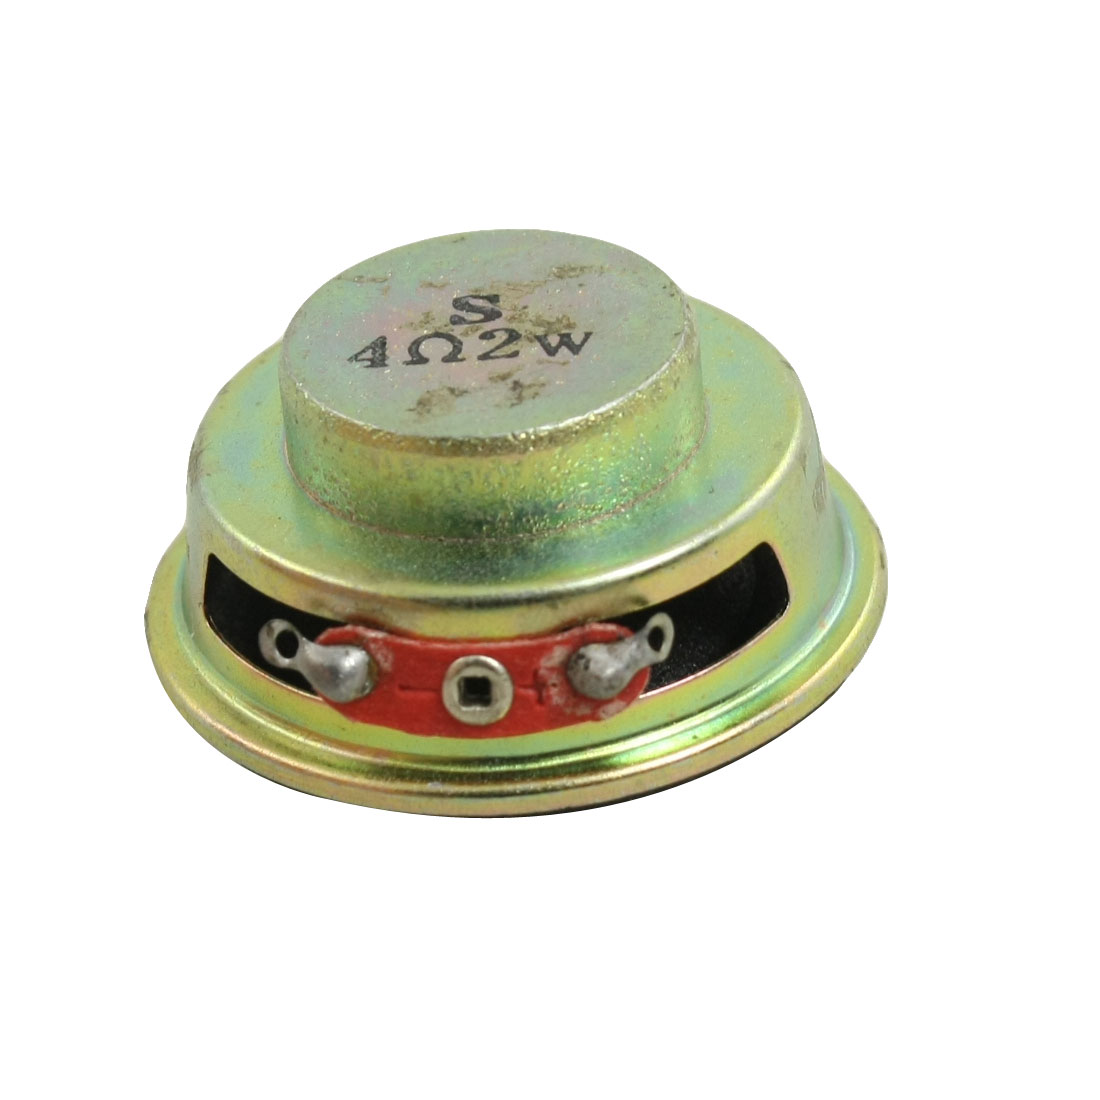 "4 Ohm 2W 1.6"" Dia. Multimedia Speakers Internal Magnet Speaker"